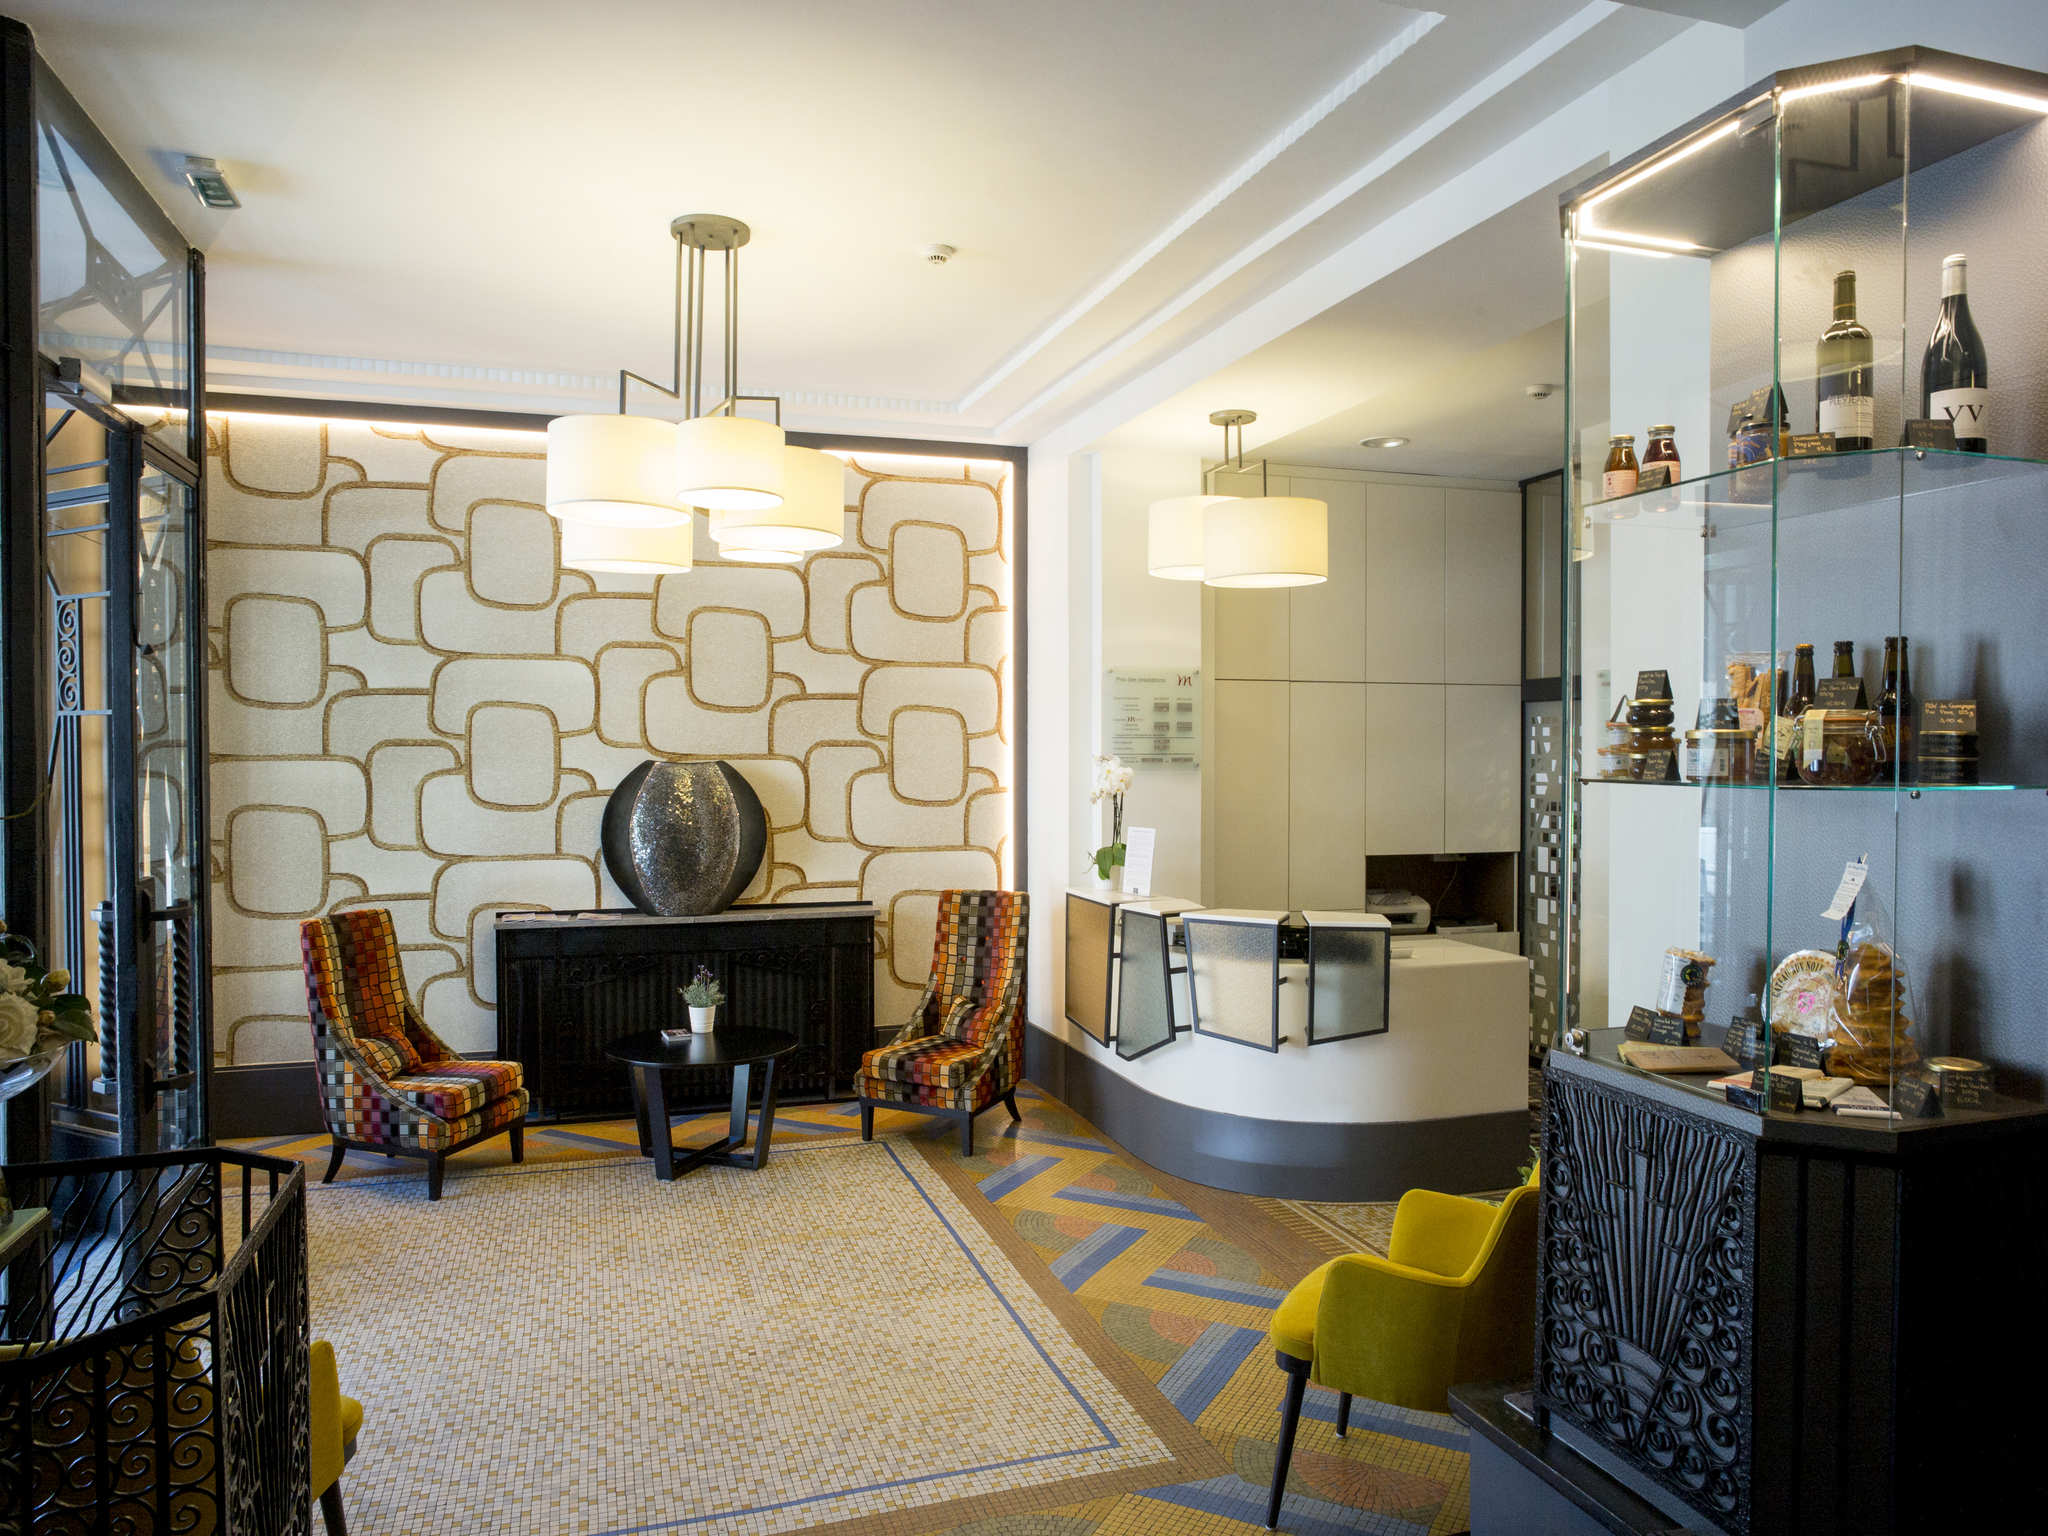 top htel htel mercure rodez cathdrale with cash piscine rodez. Black Bedroom Furniture Sets. Home Design Ideas